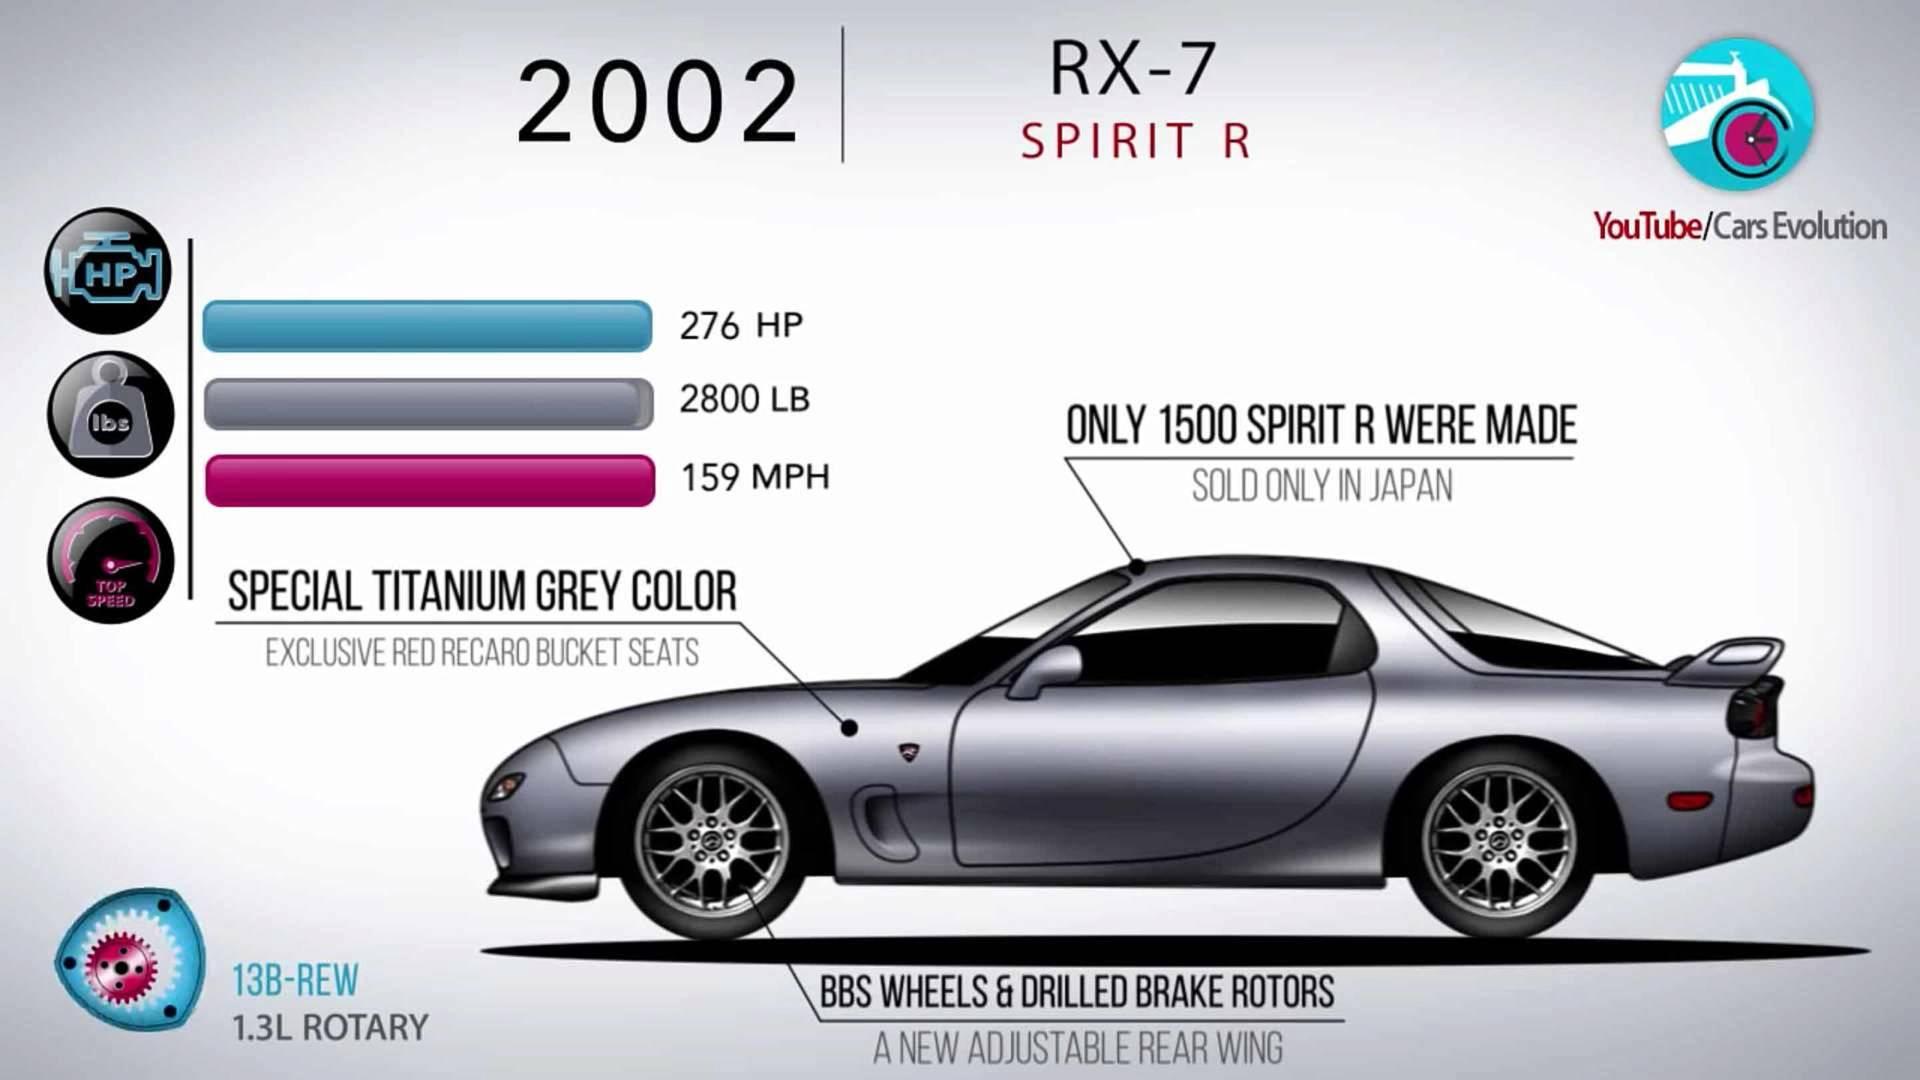 Kelebihan Kekurangan Mazda Rx Murah Berkualitas